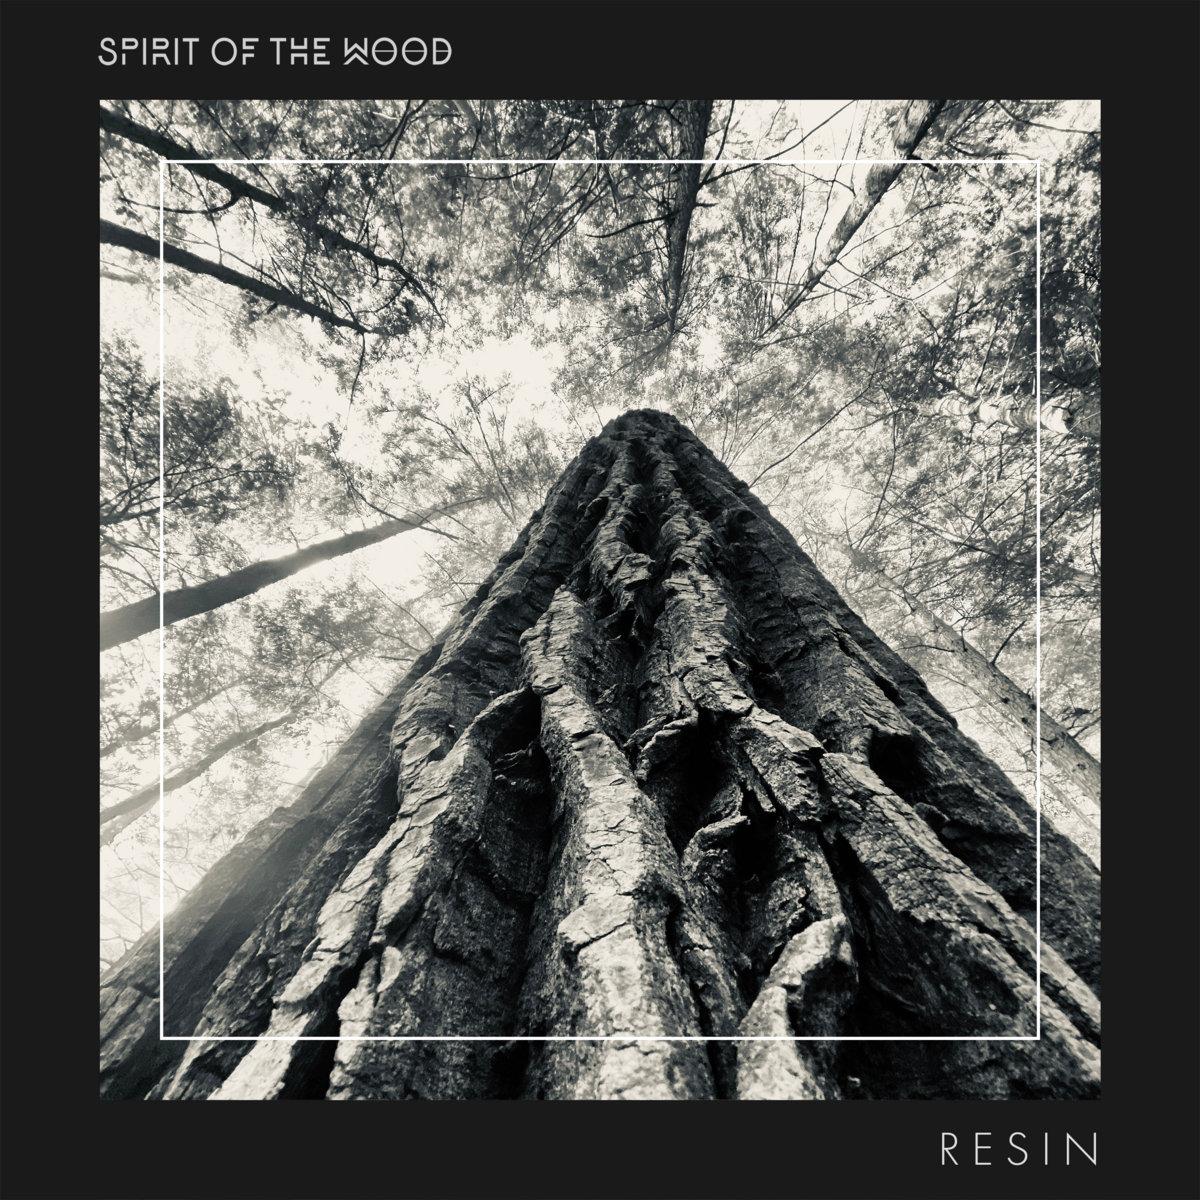 Spirit of the Wood - Resin - Single Artwork